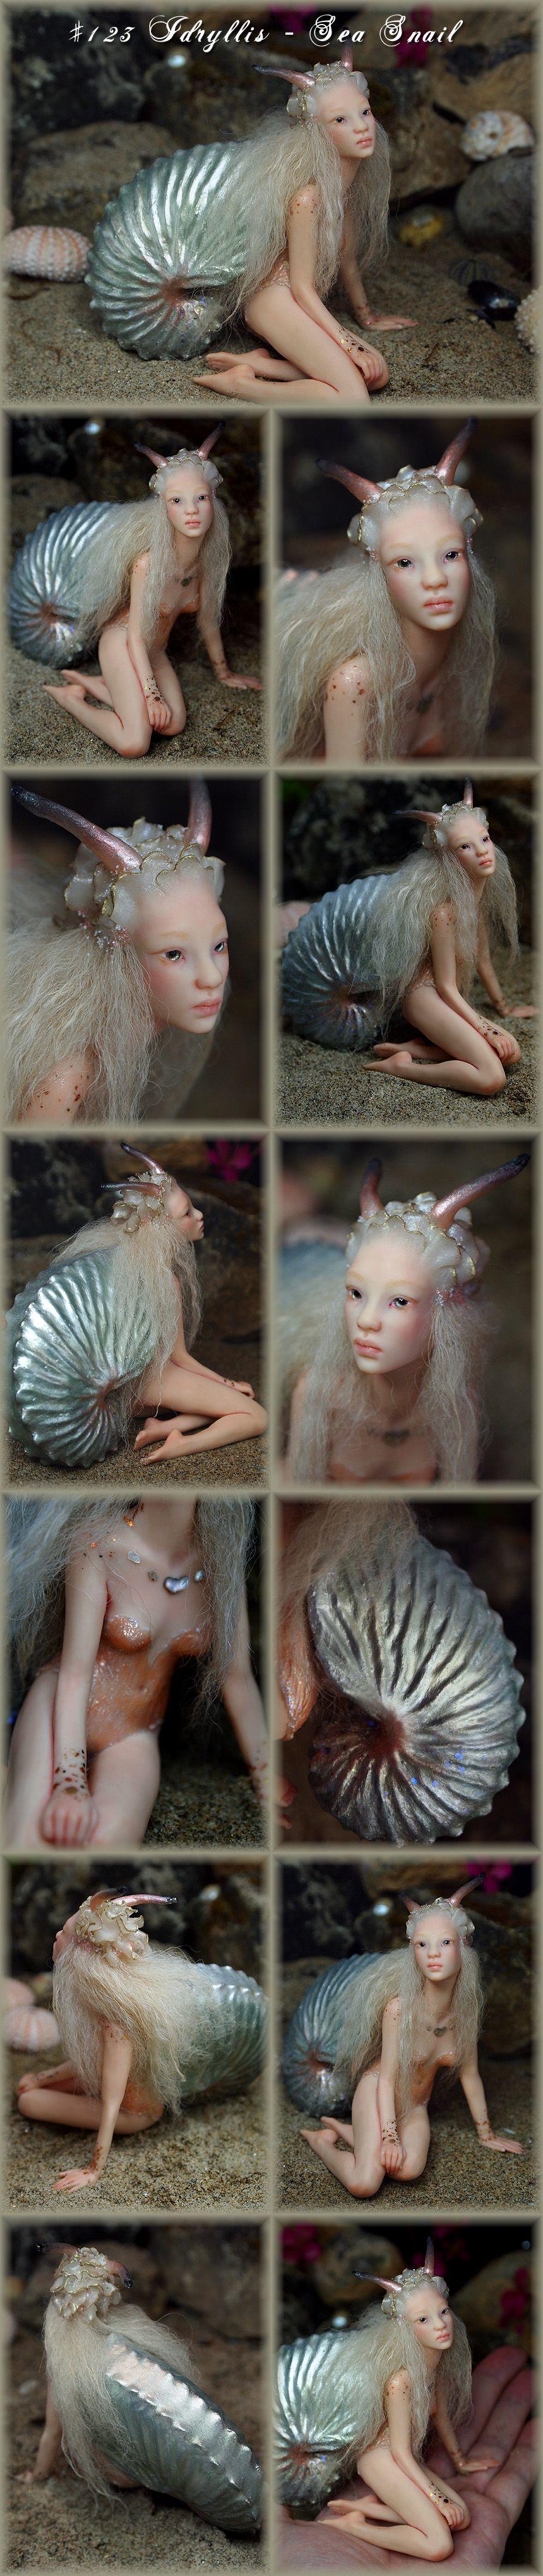 Nenúfar Blanco ~ #123 Idryllis - Sea Snail